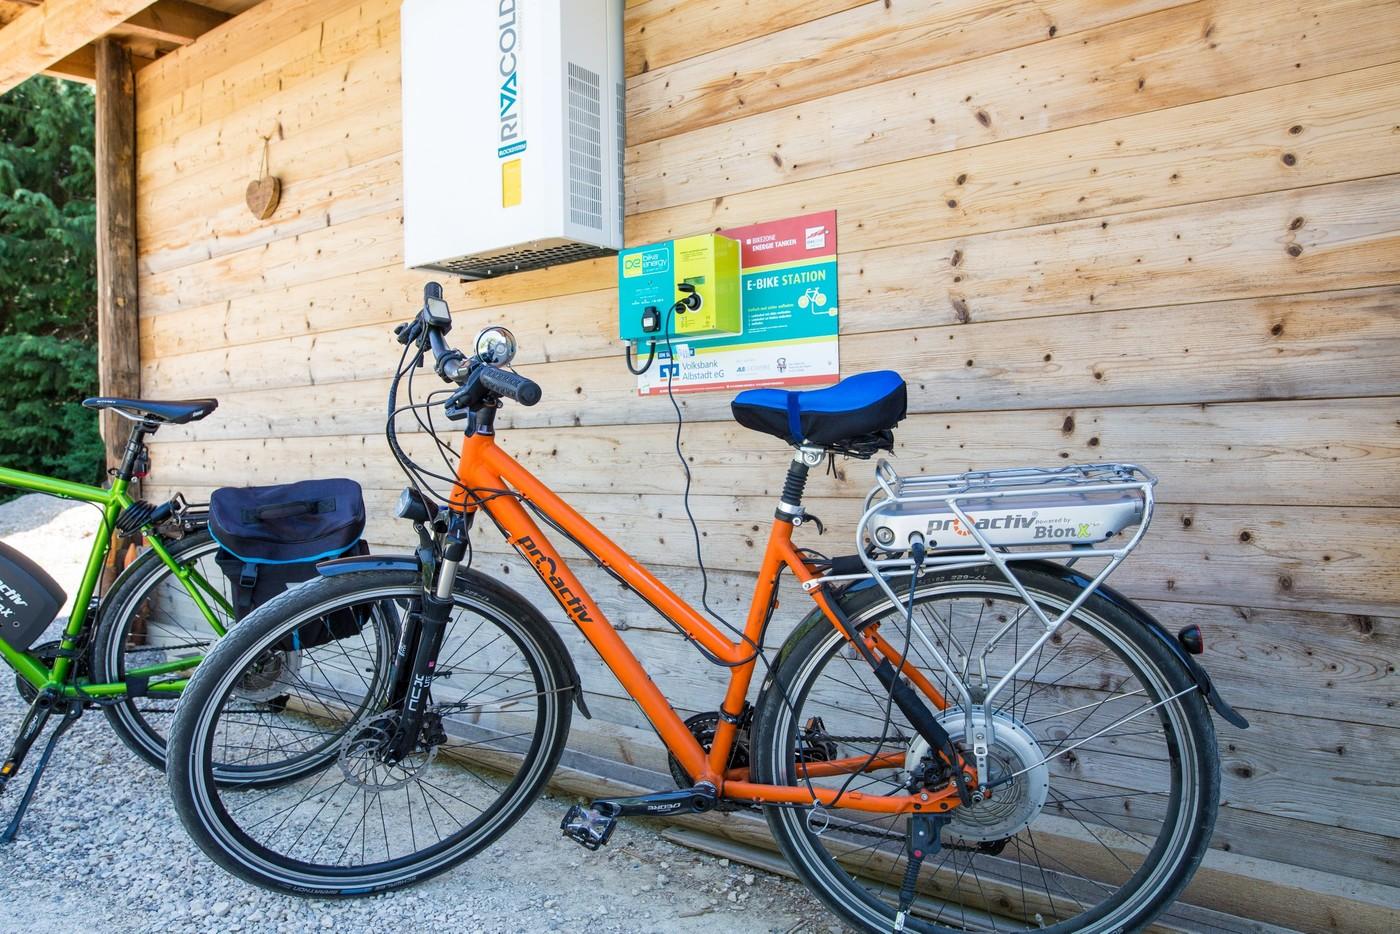 E-Bike beim Laden